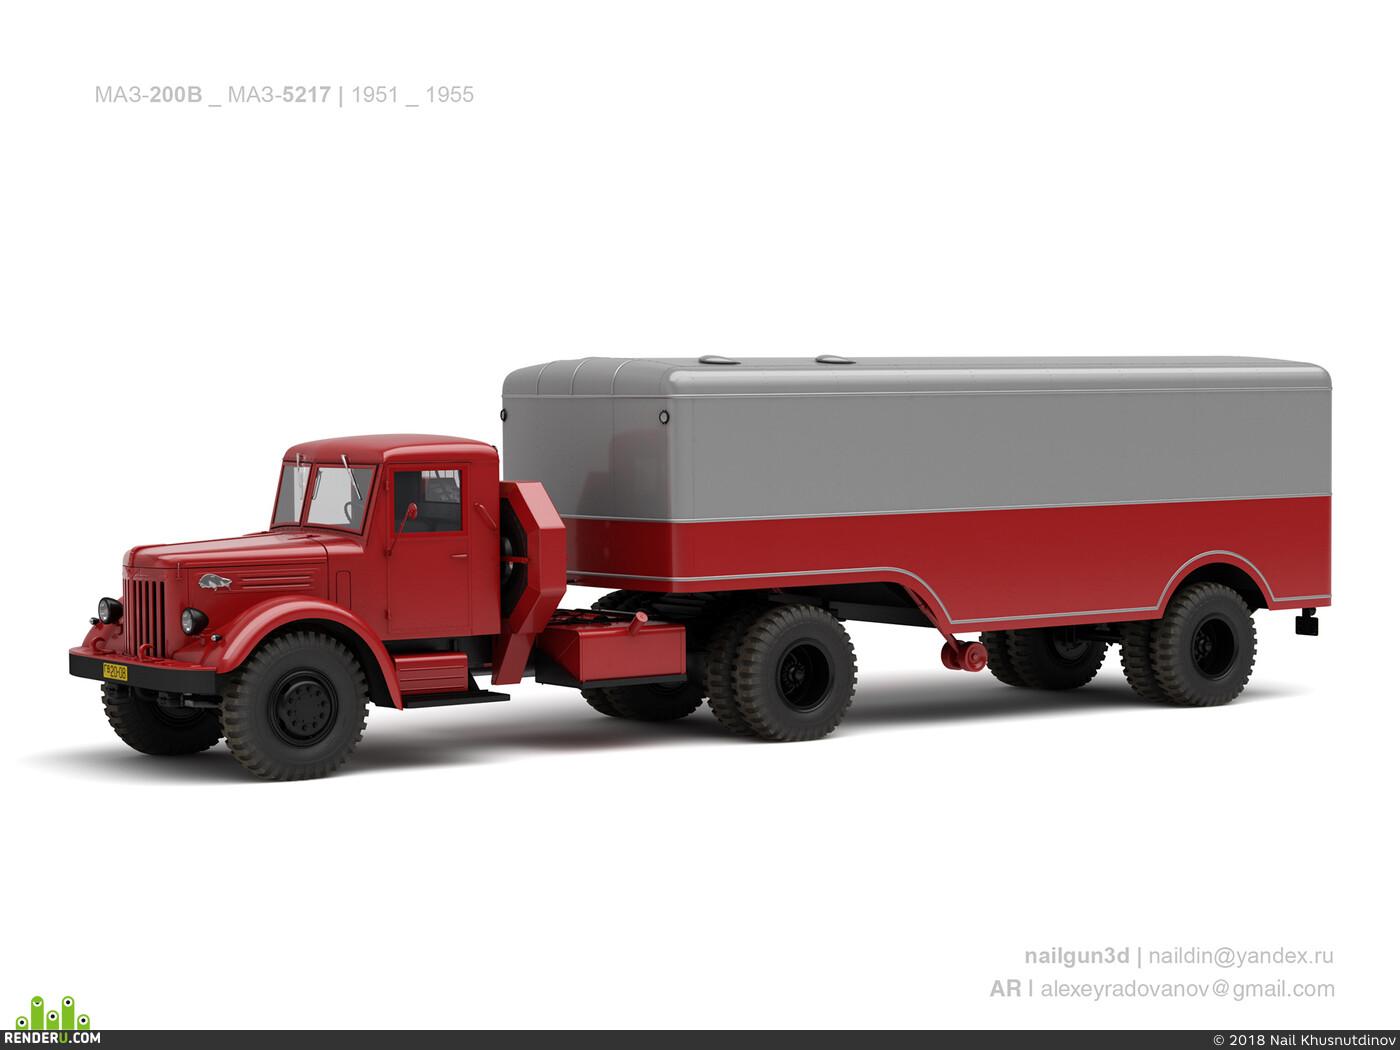 маз, седельник, ретро, ссср, грузовик